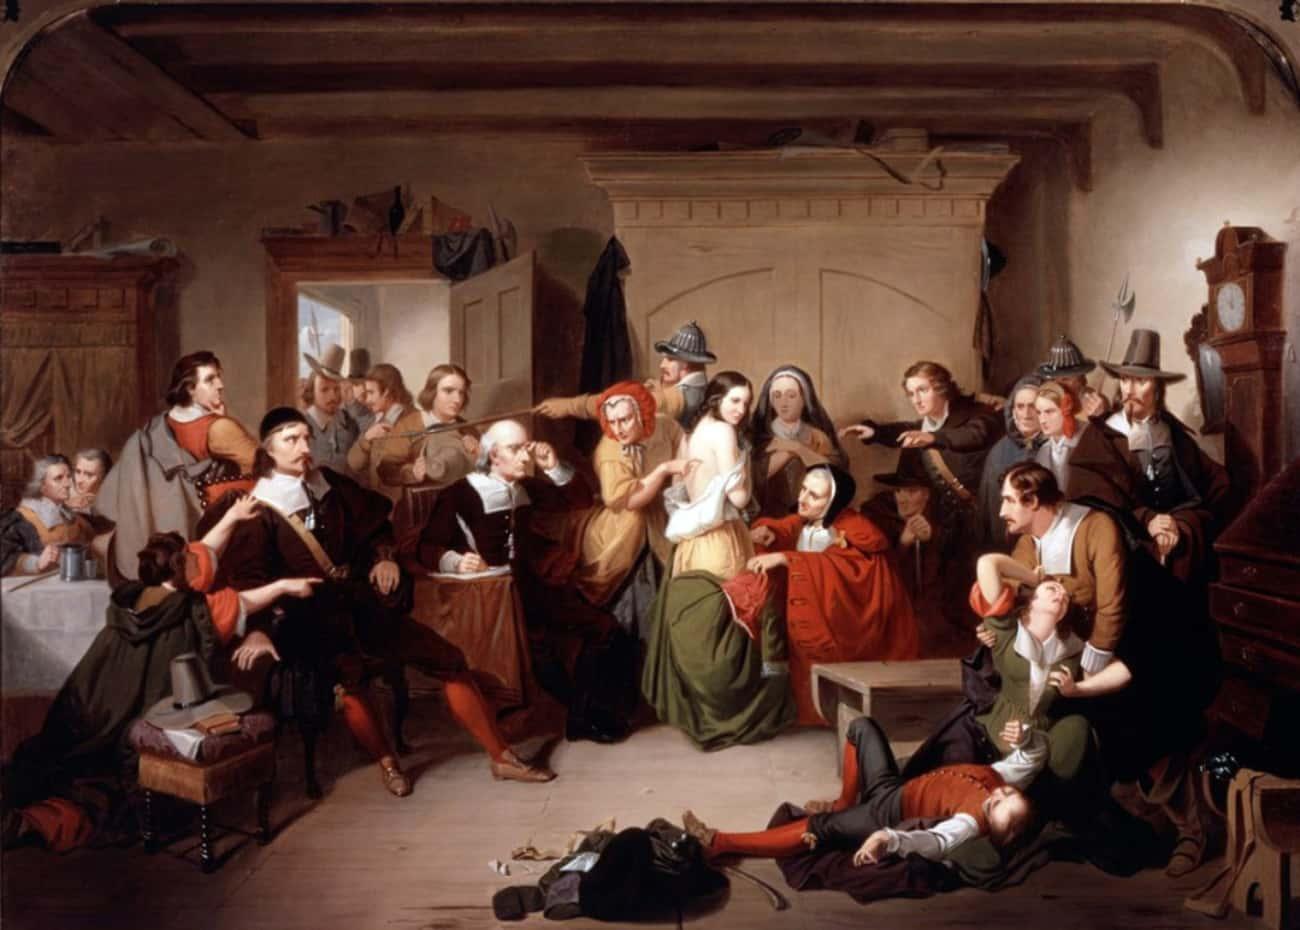 Salem Witch Trials facts